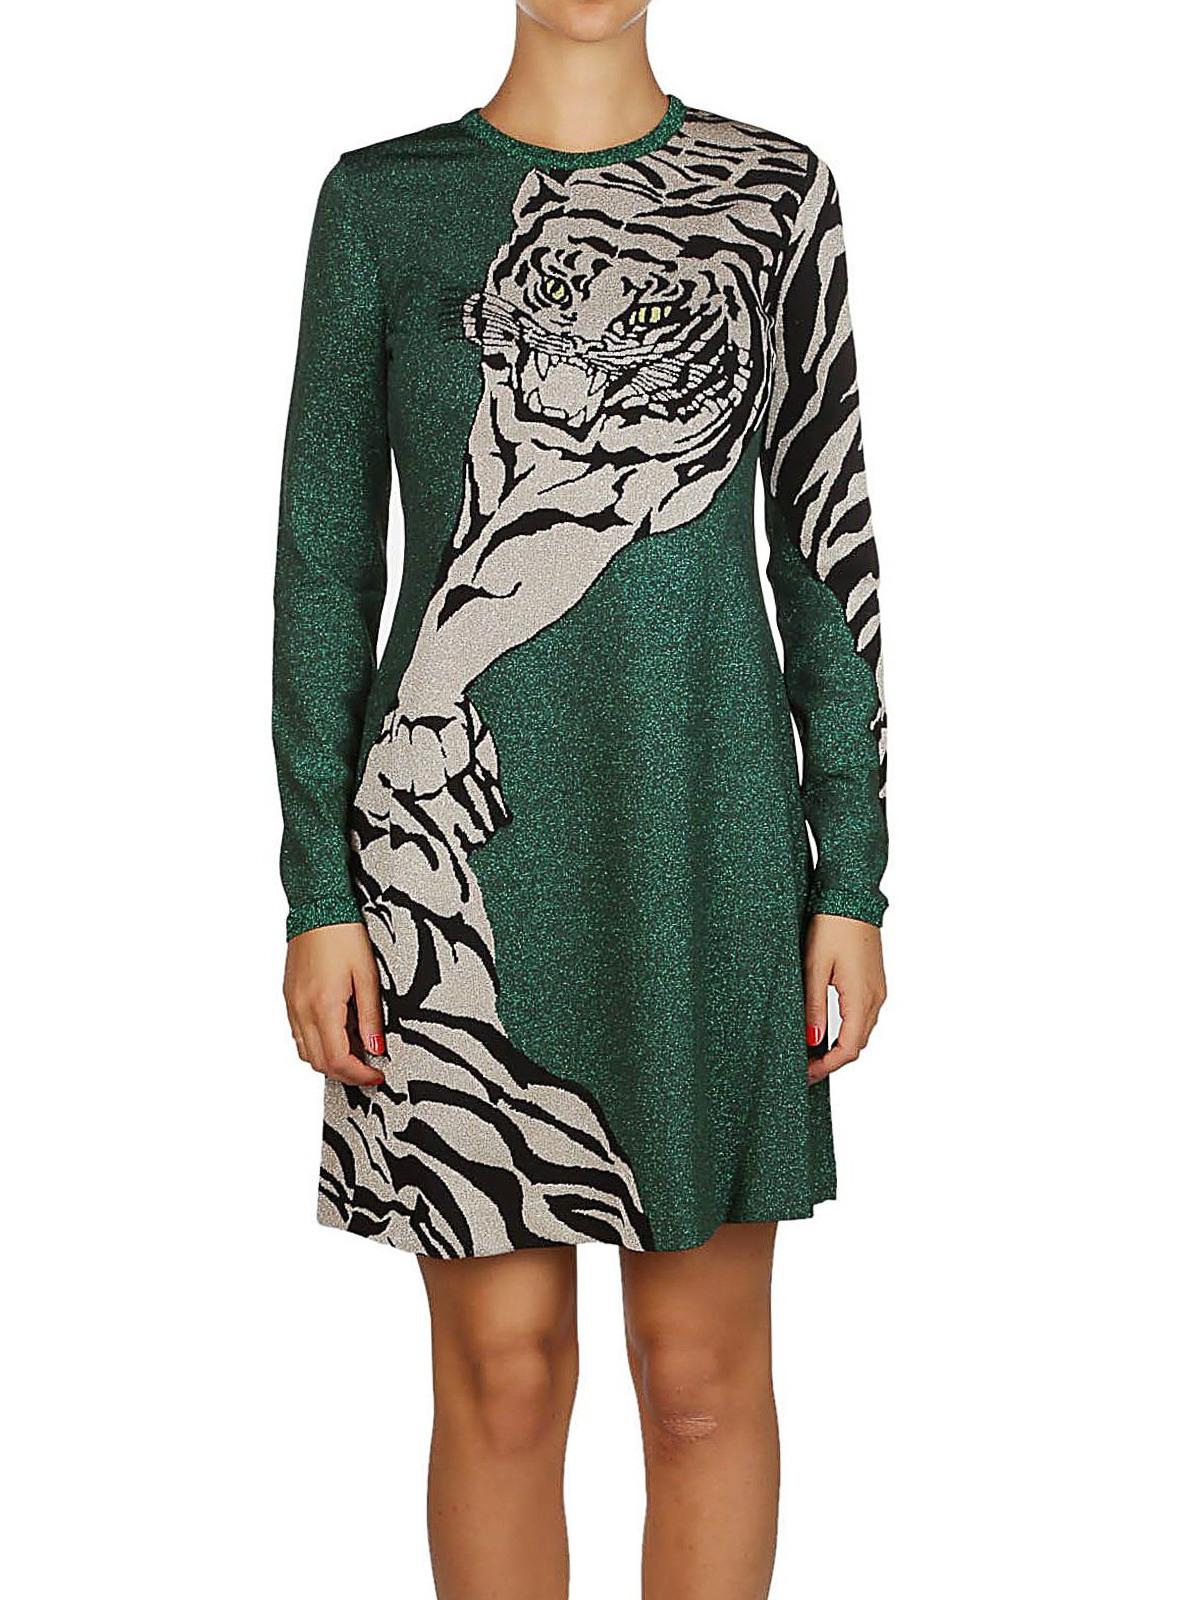 10 Coolste Kleid Grün Kurz Stylish Elegant Kleid Grün Kurz für 2019